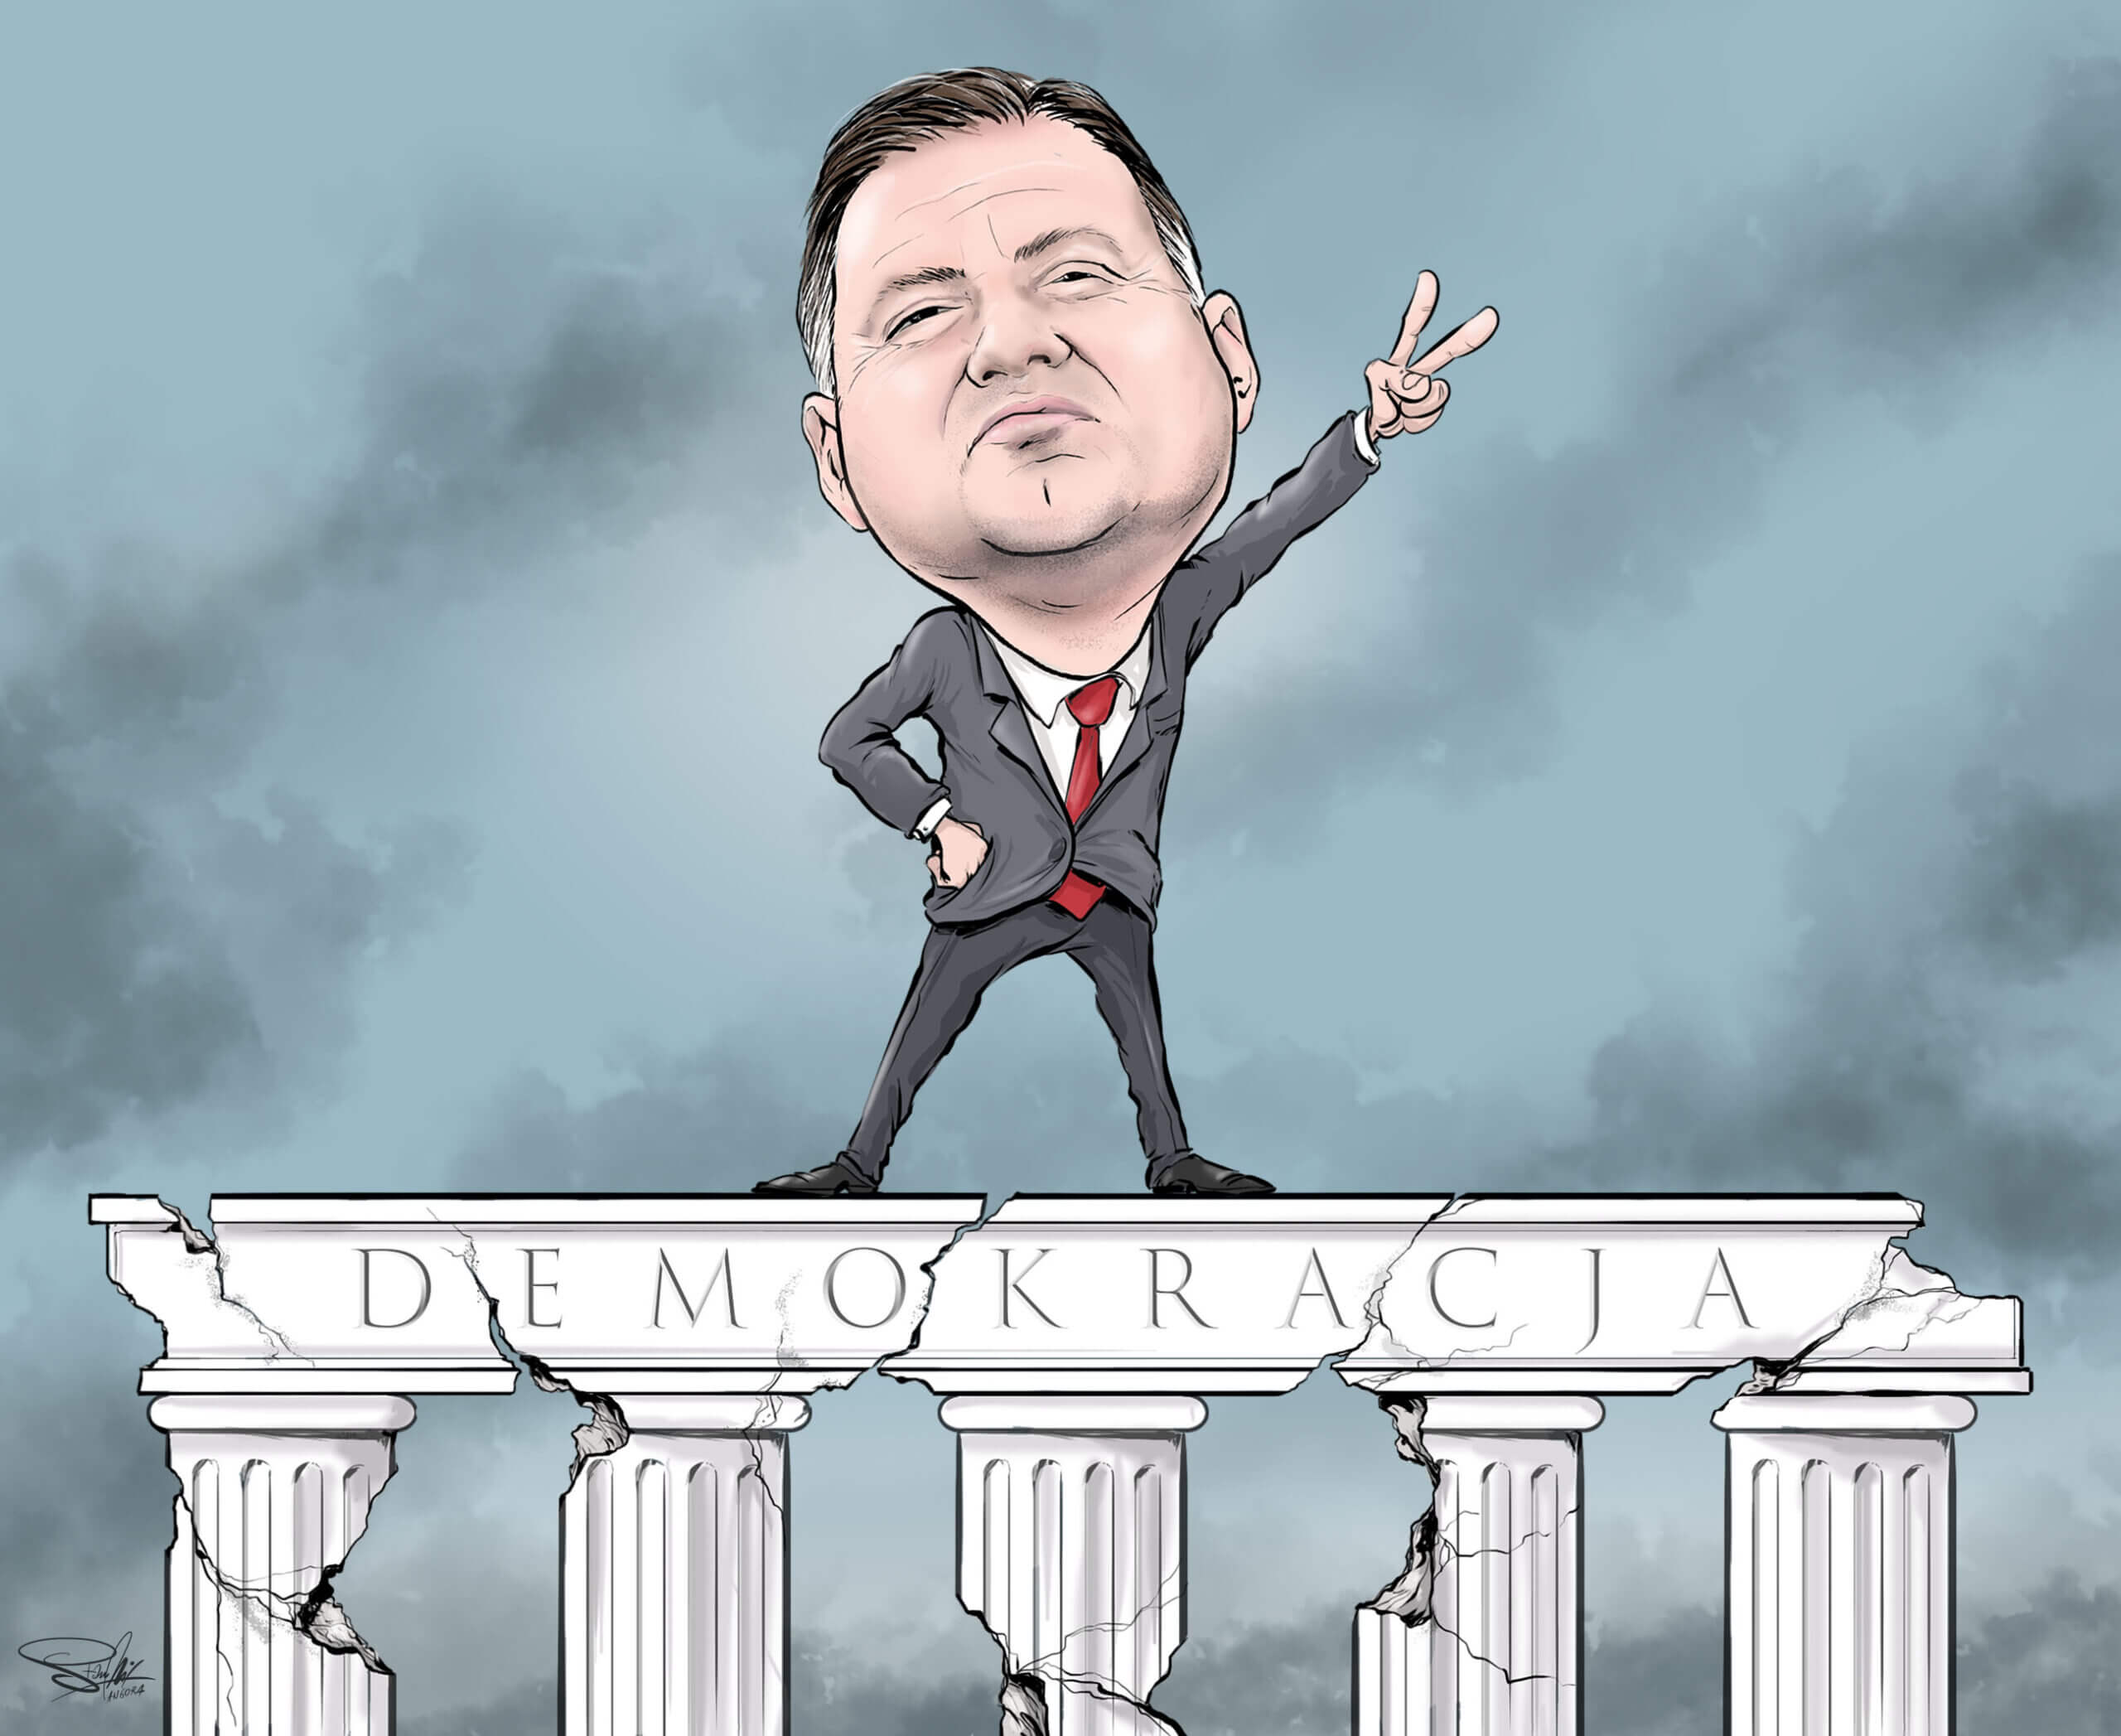 karykatura prezydent duda demokracja